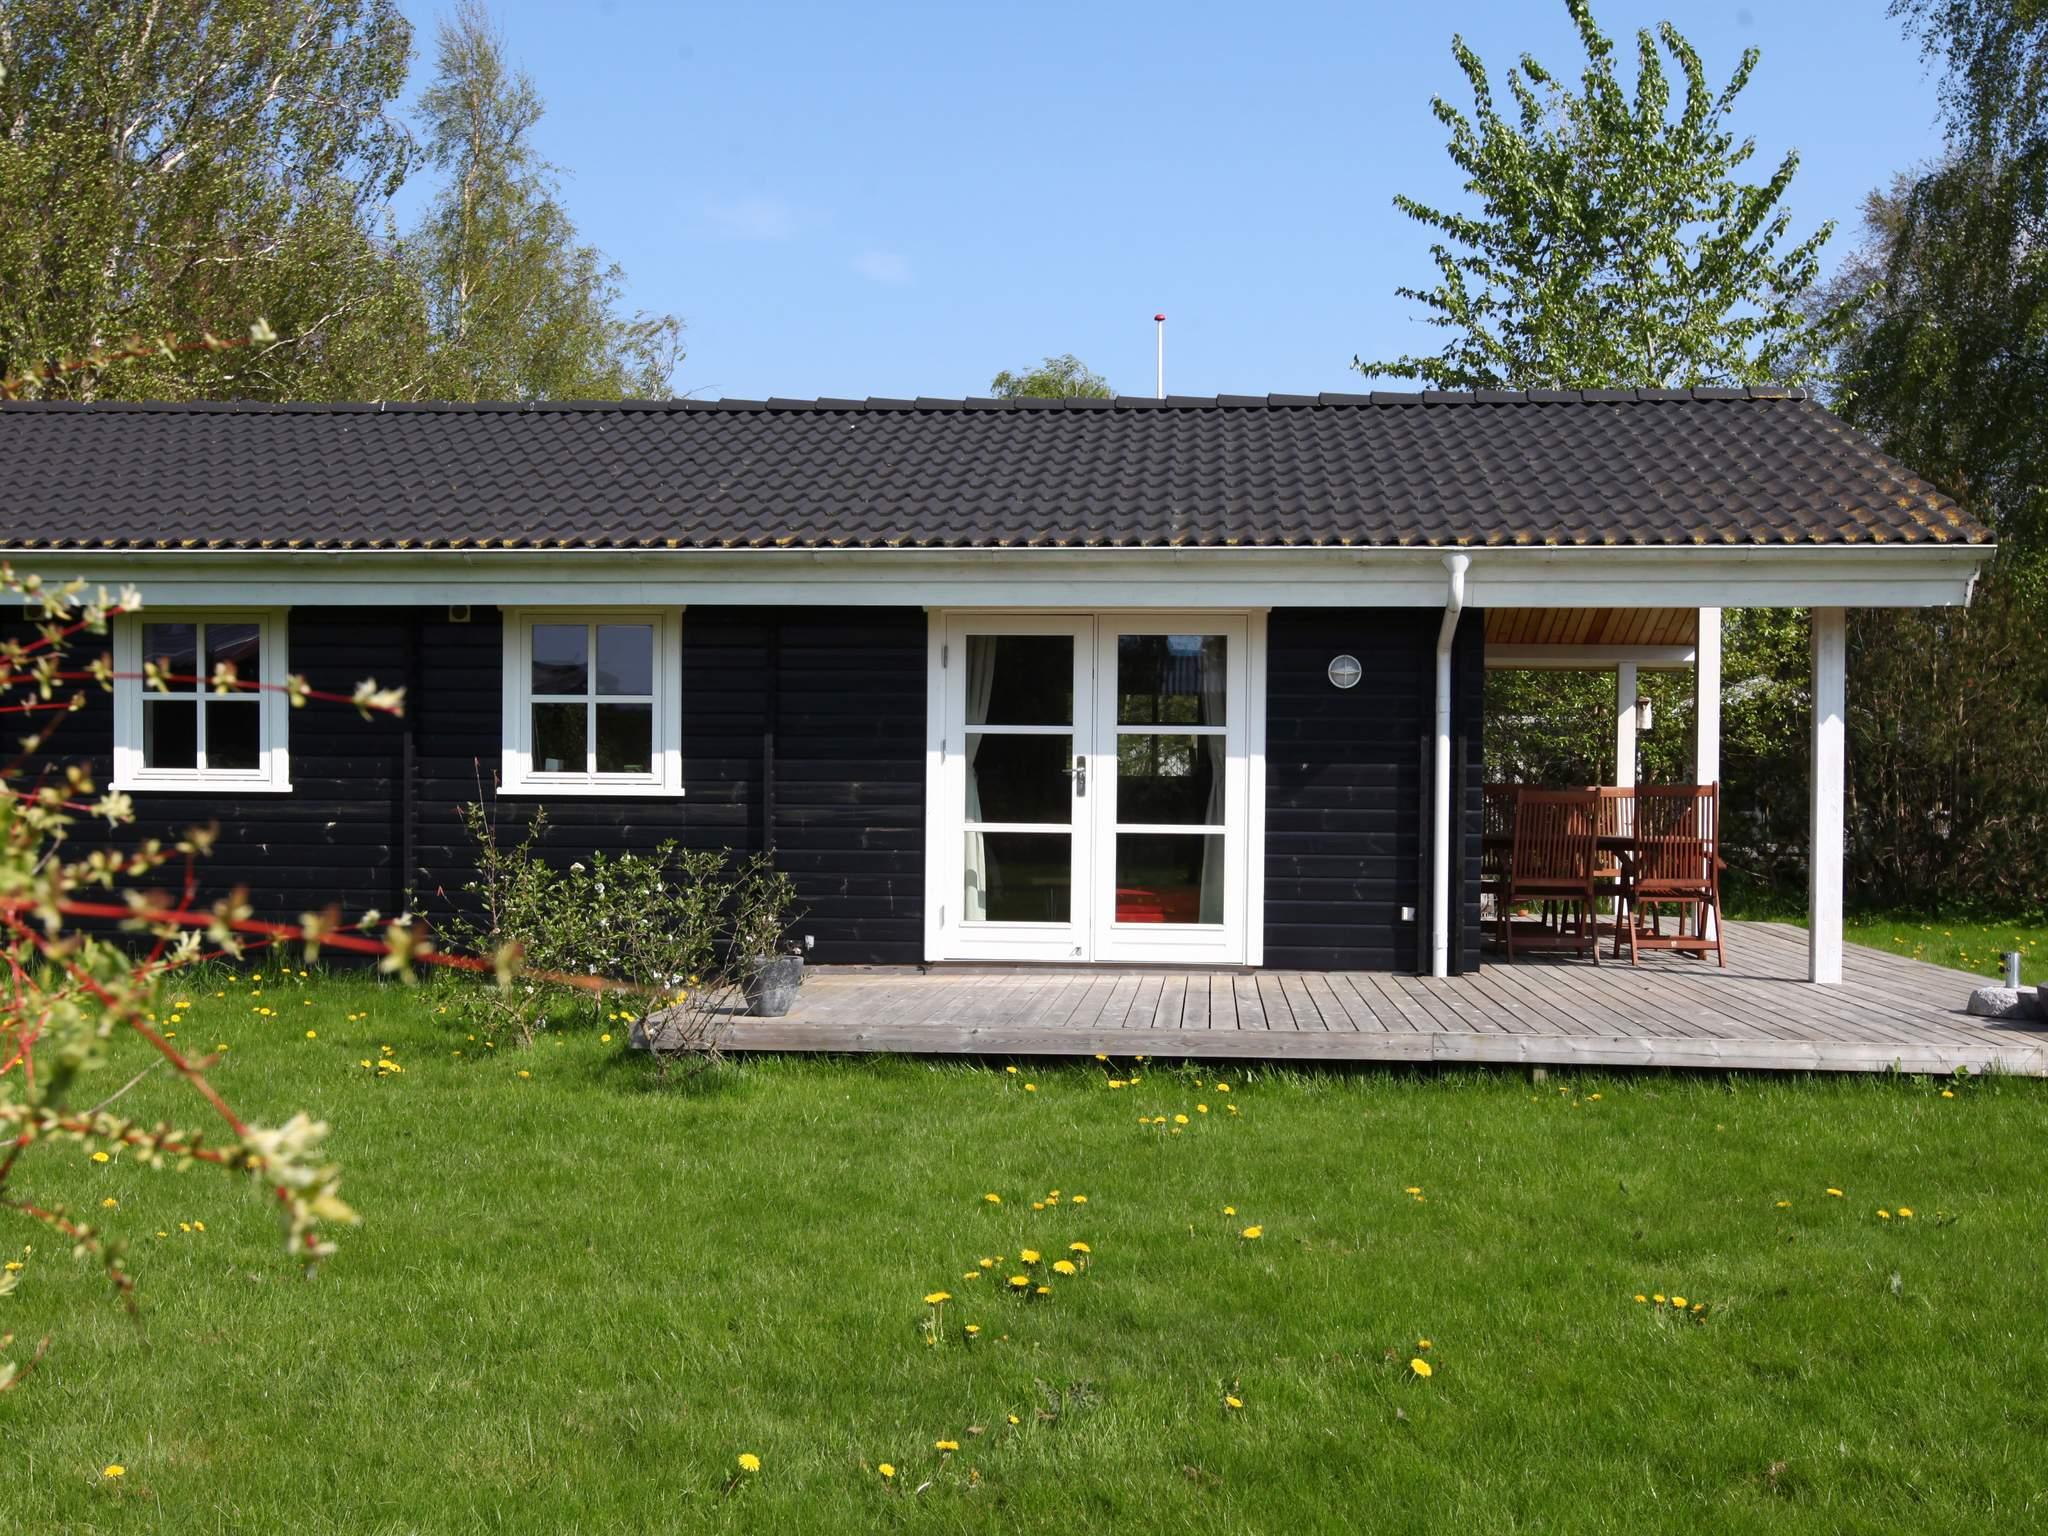 Ferienhaus Hyllingeriis (561298), Skibby, , Nordseeland, Dänemark, Bild 16